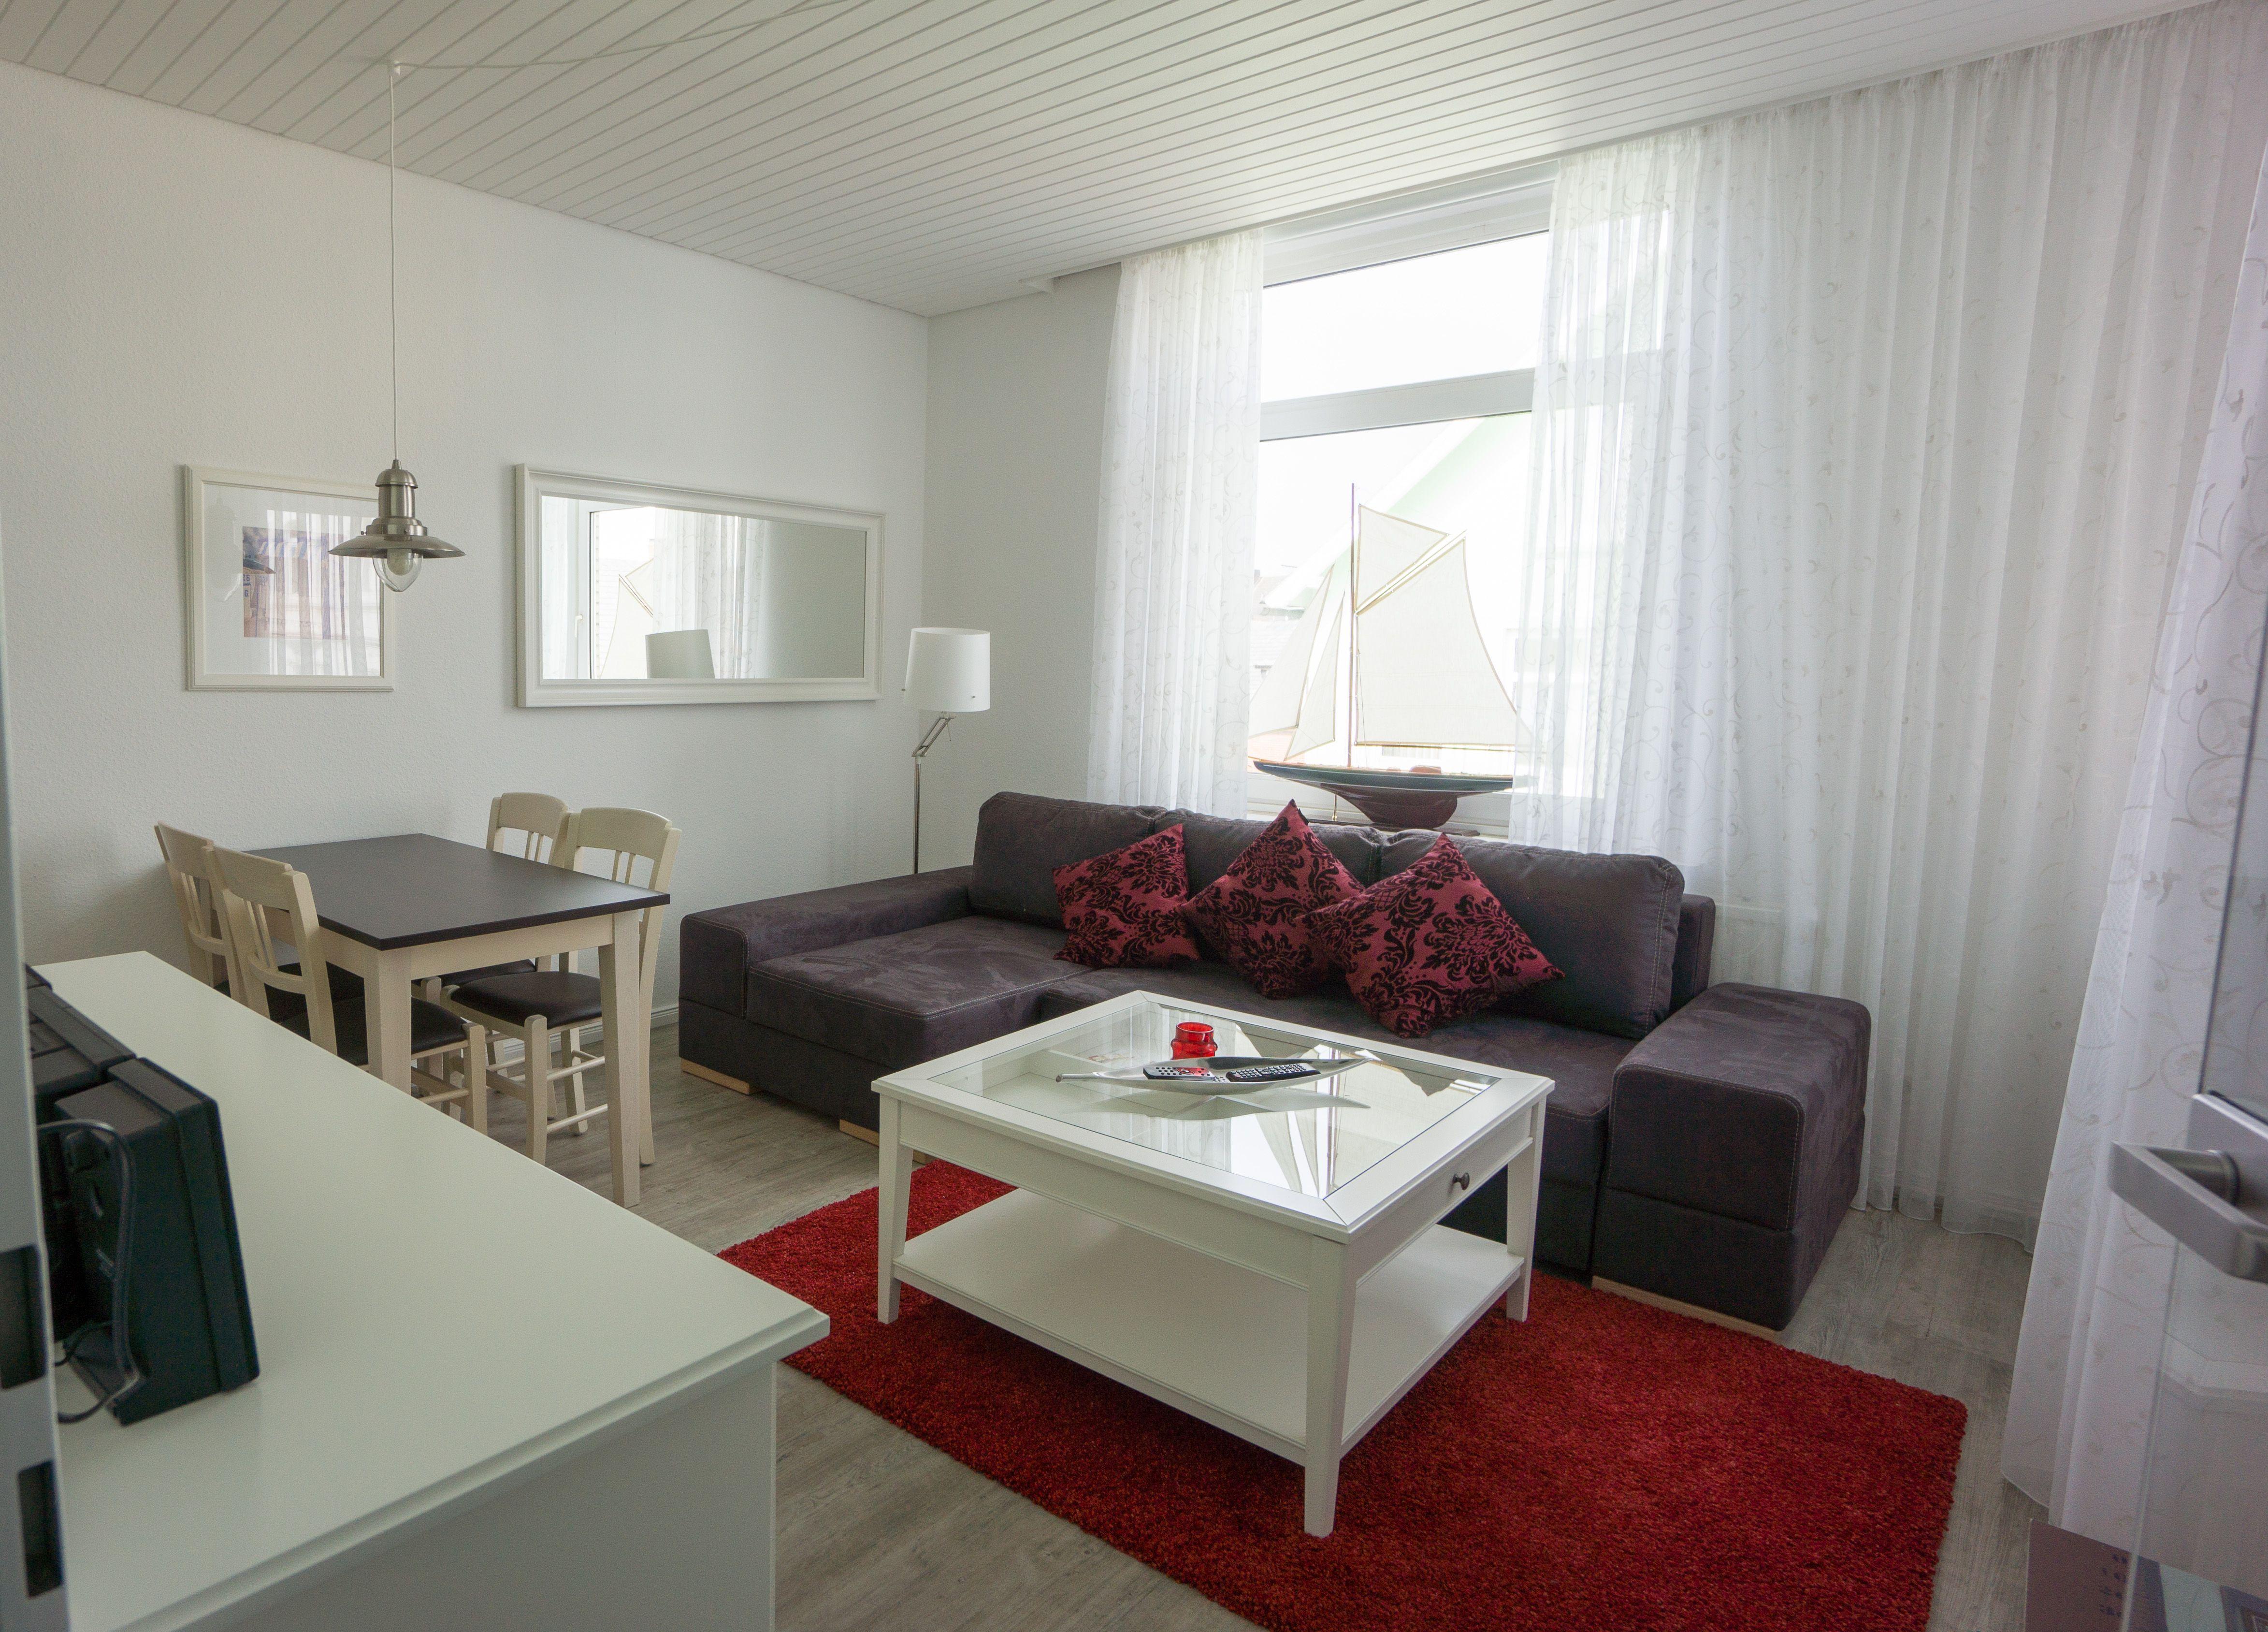 Domizil am Deich Appartements, Hotel Stadt Cuxhaven,